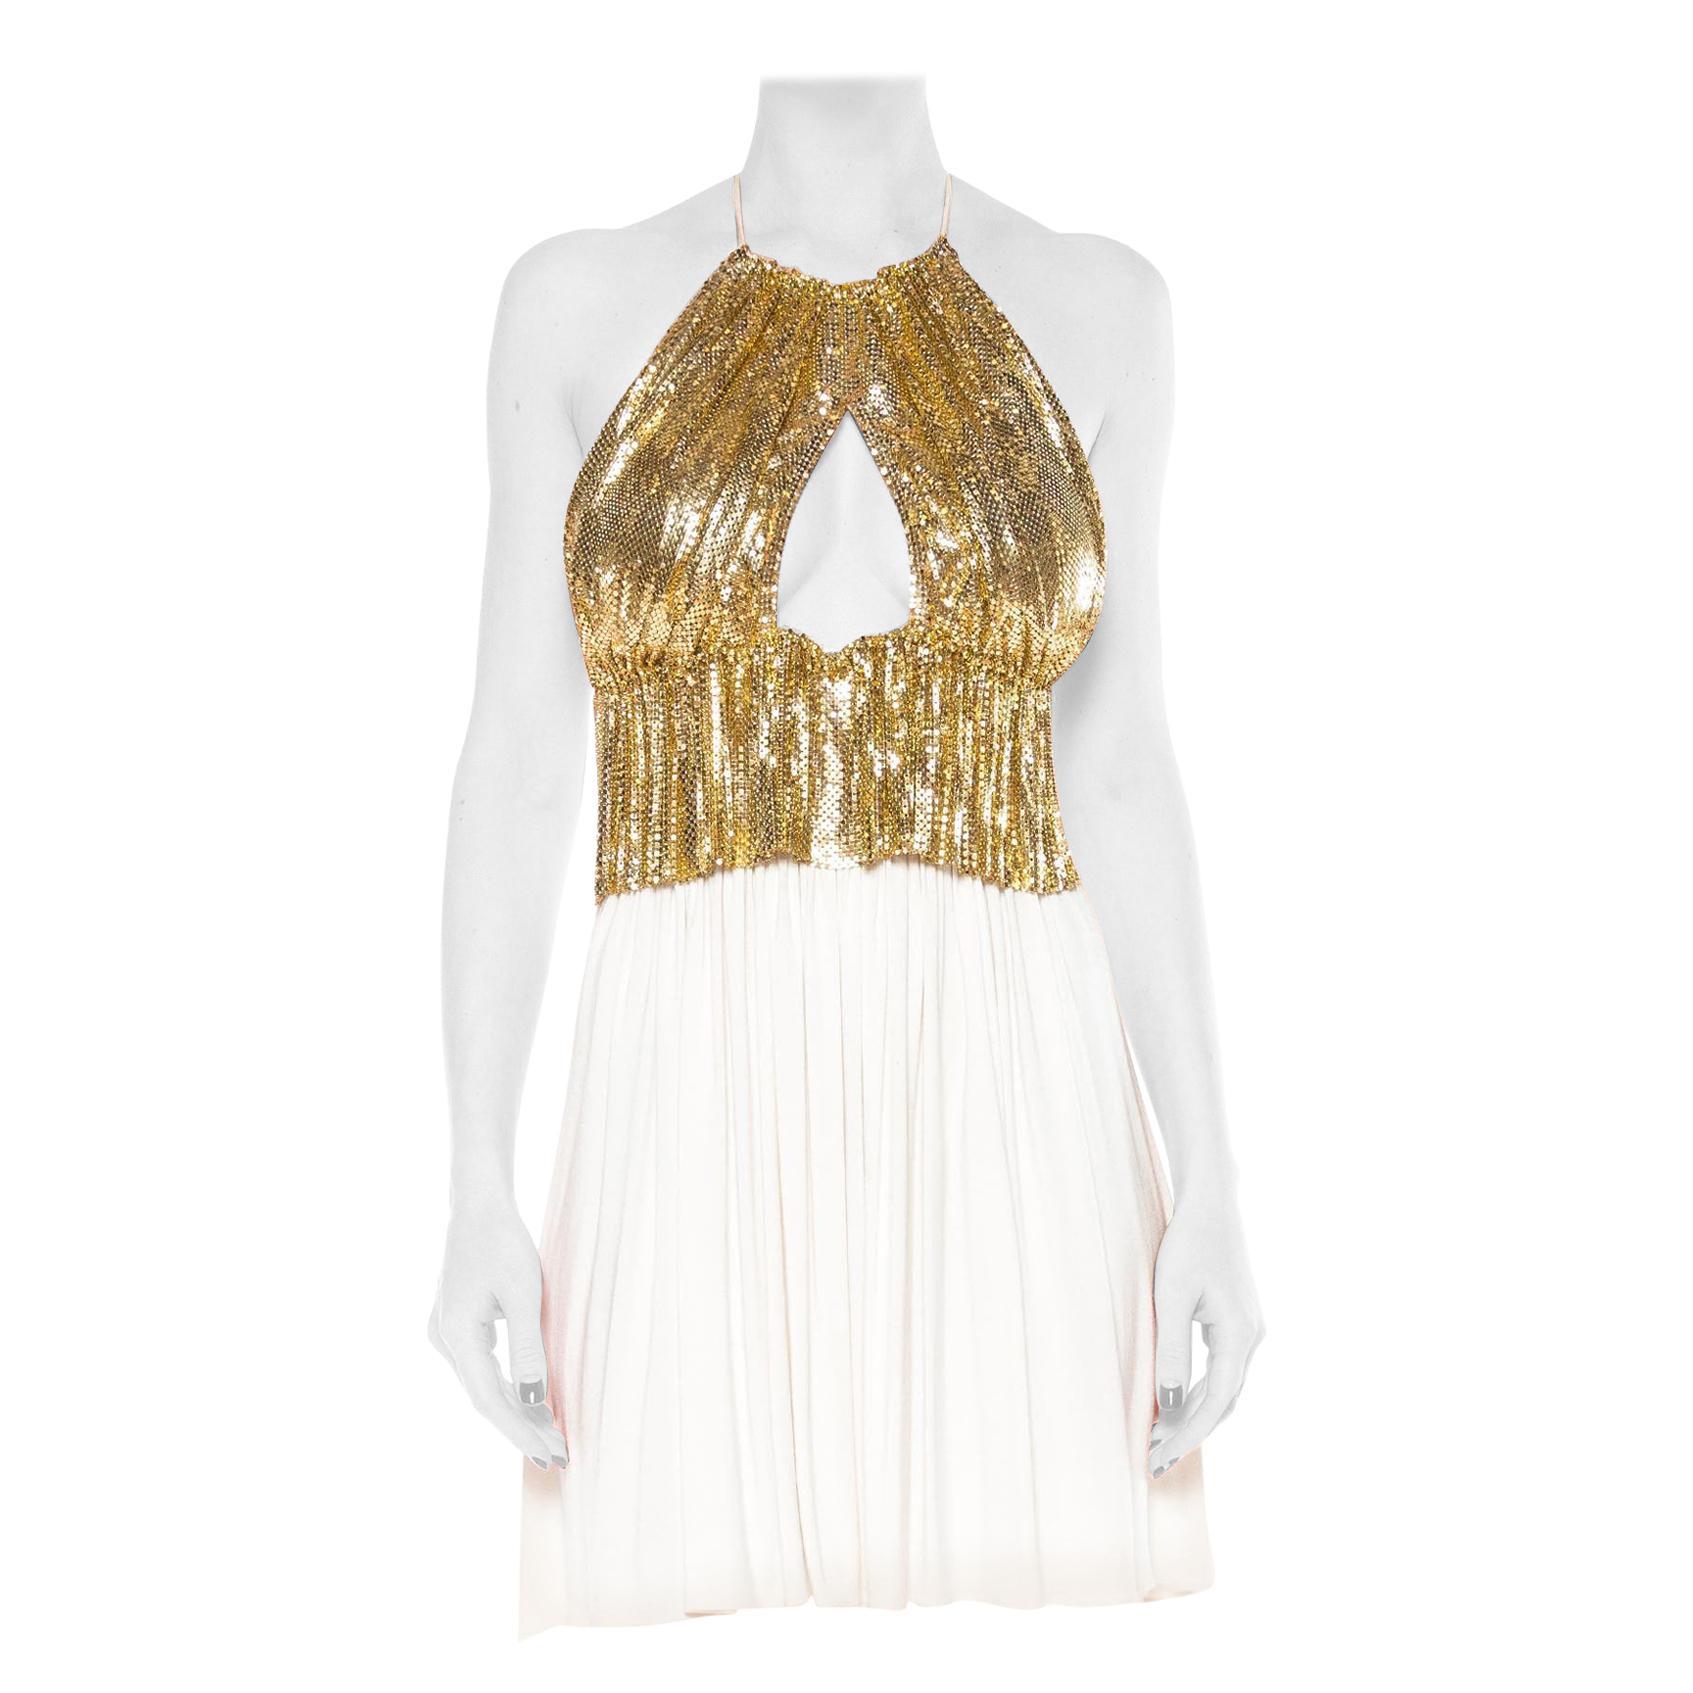 MORPHEW COLLECTION Gold Metal Mesh & Cream Rayon Jersey Halter Dress